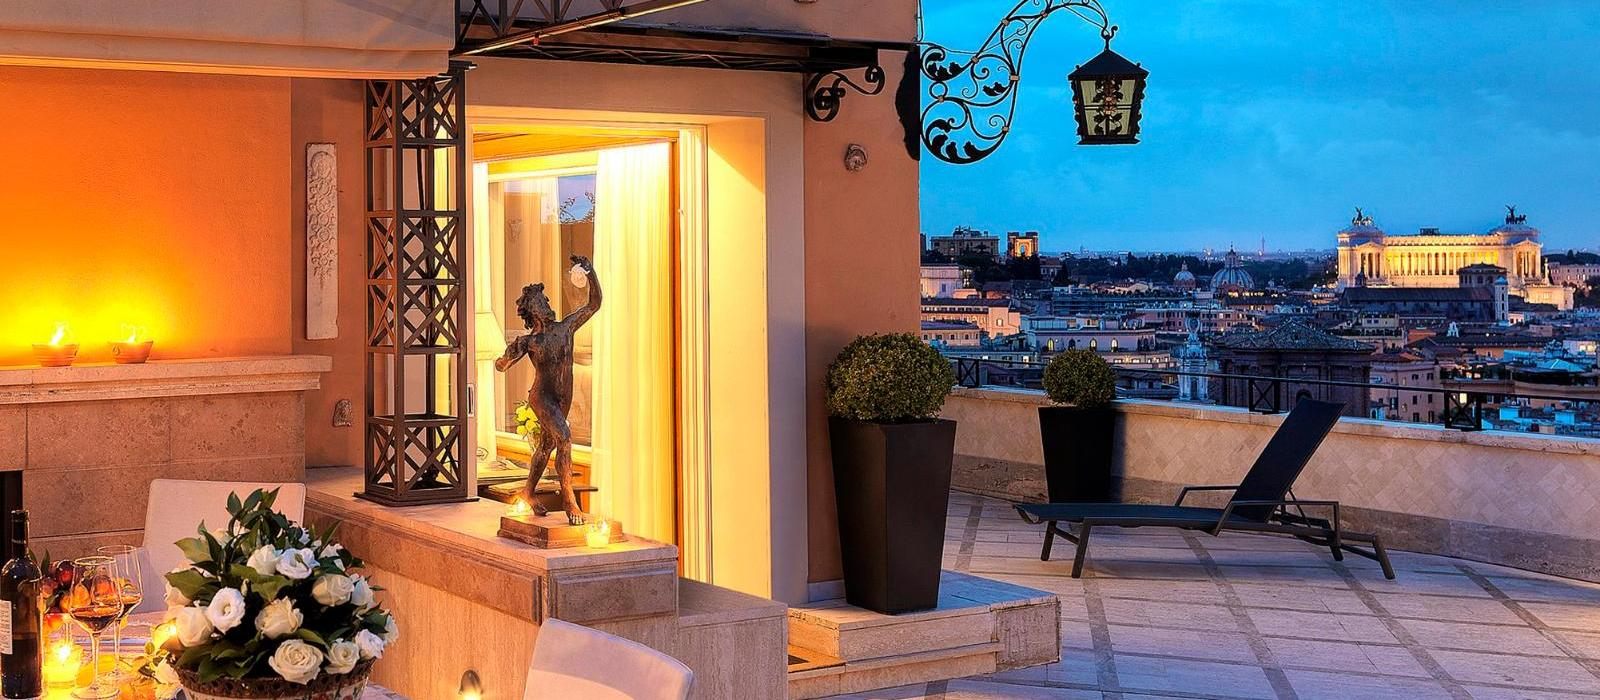 哈斯勒罗马酒店(Hassler Roma) 图片  www.lhw.cn